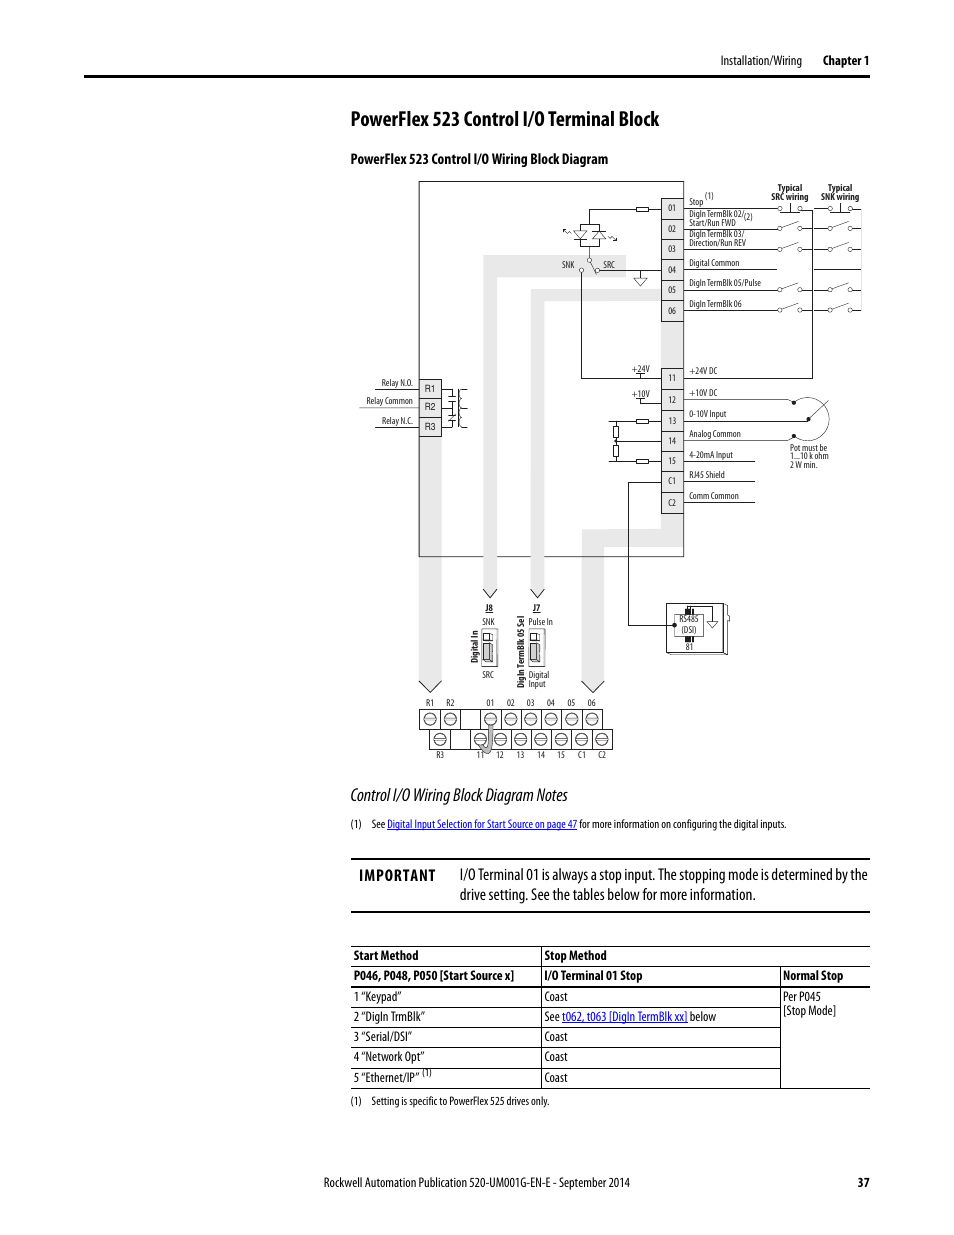 Powerflex 70 Wiring Diagram 4